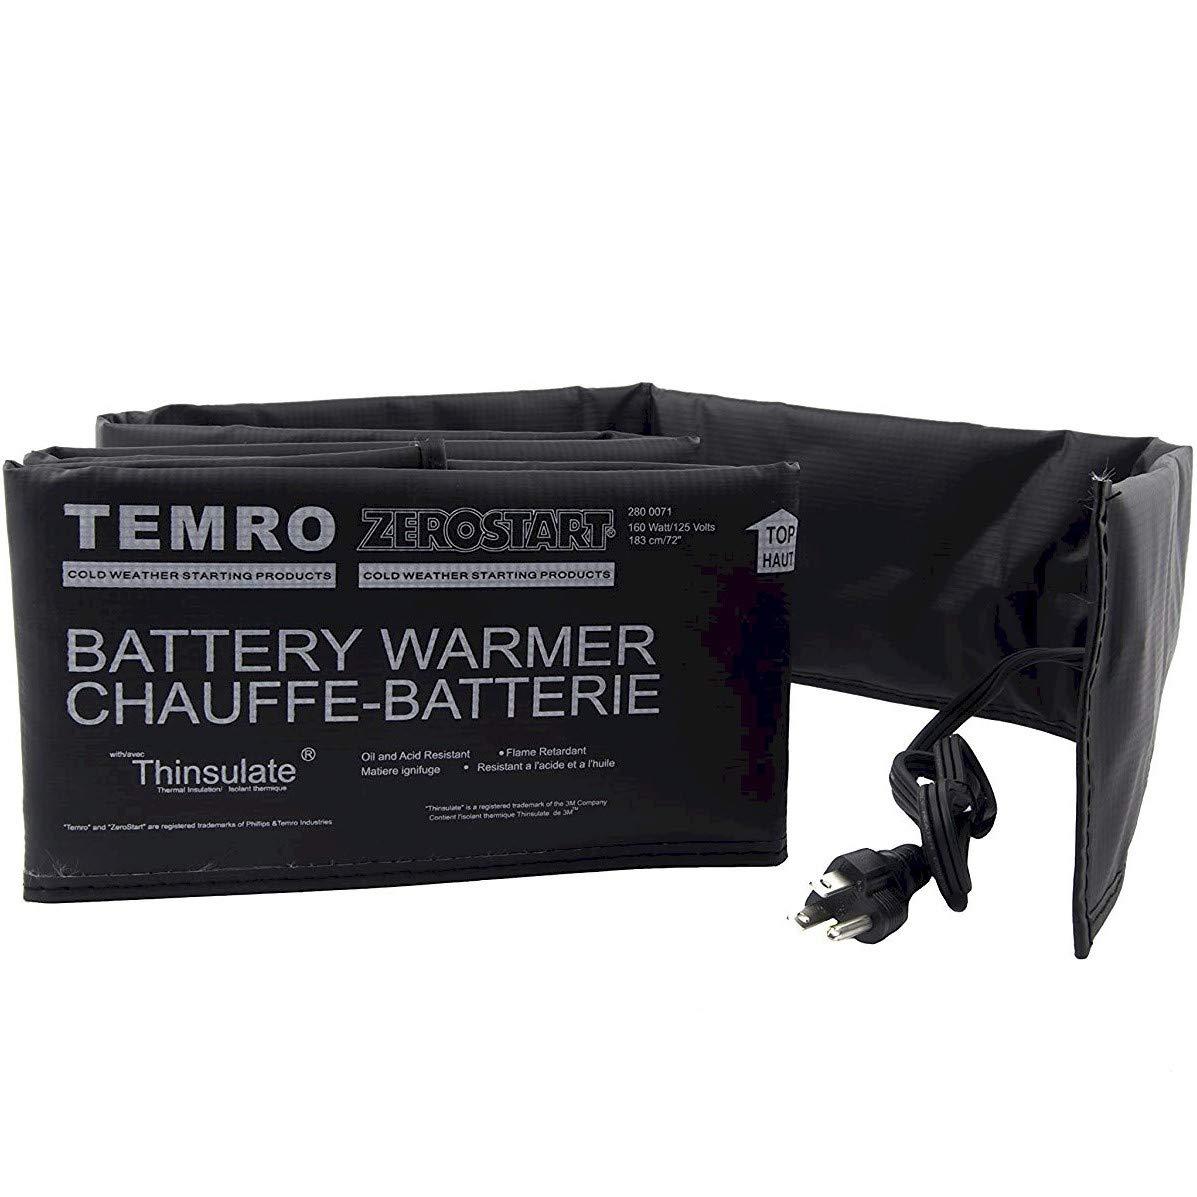 Zerostart 2800071 Electric Battery Blanket Battery Heater Wrap, 72-Inch   CSA Approved   120 Volts   80 Watts